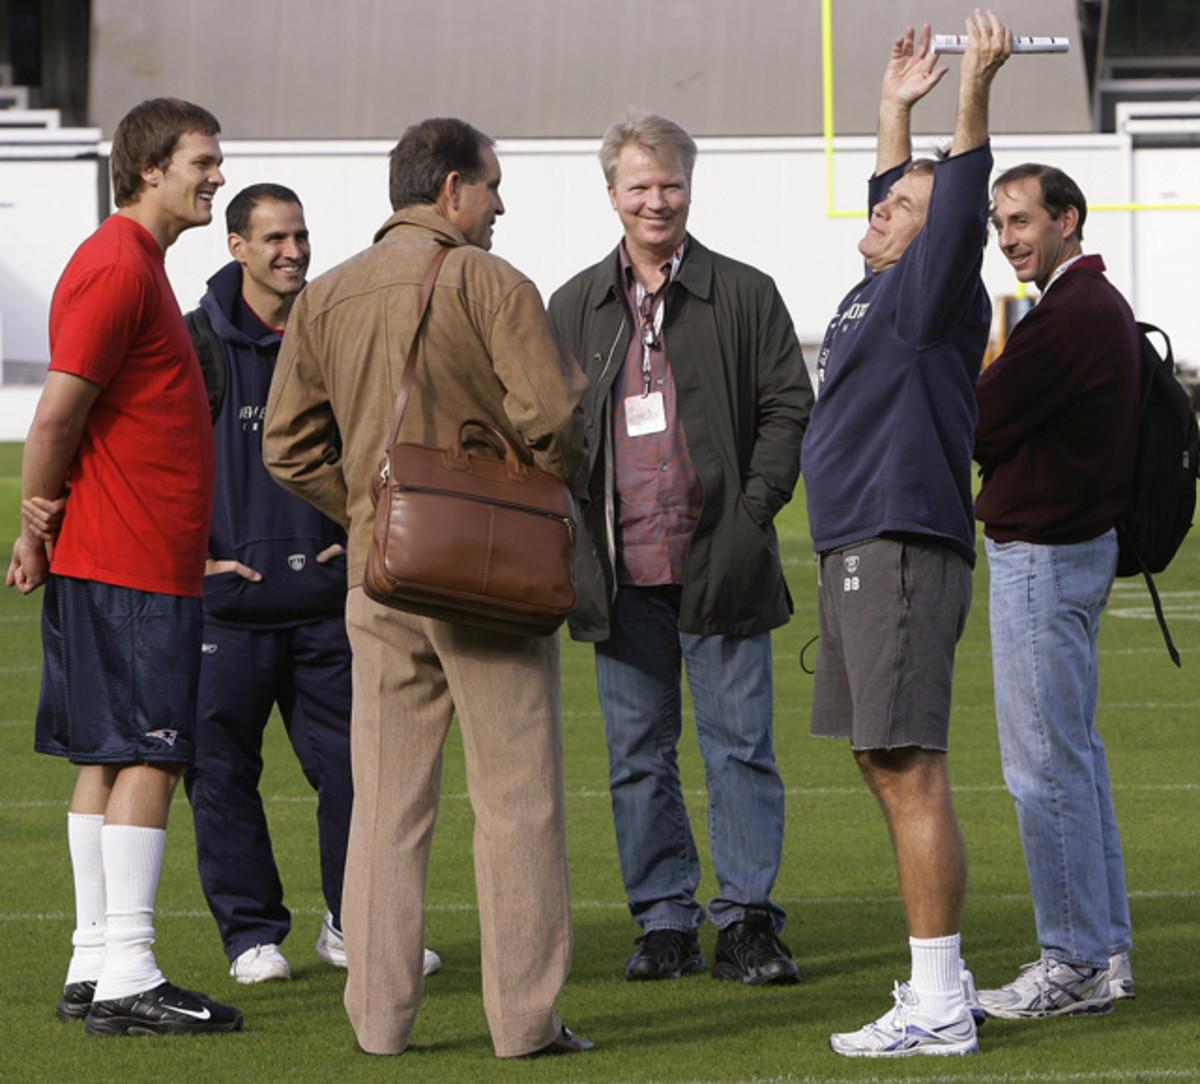 Bill Belichick, Jim Nantz, Tom Brady and Phil Simms